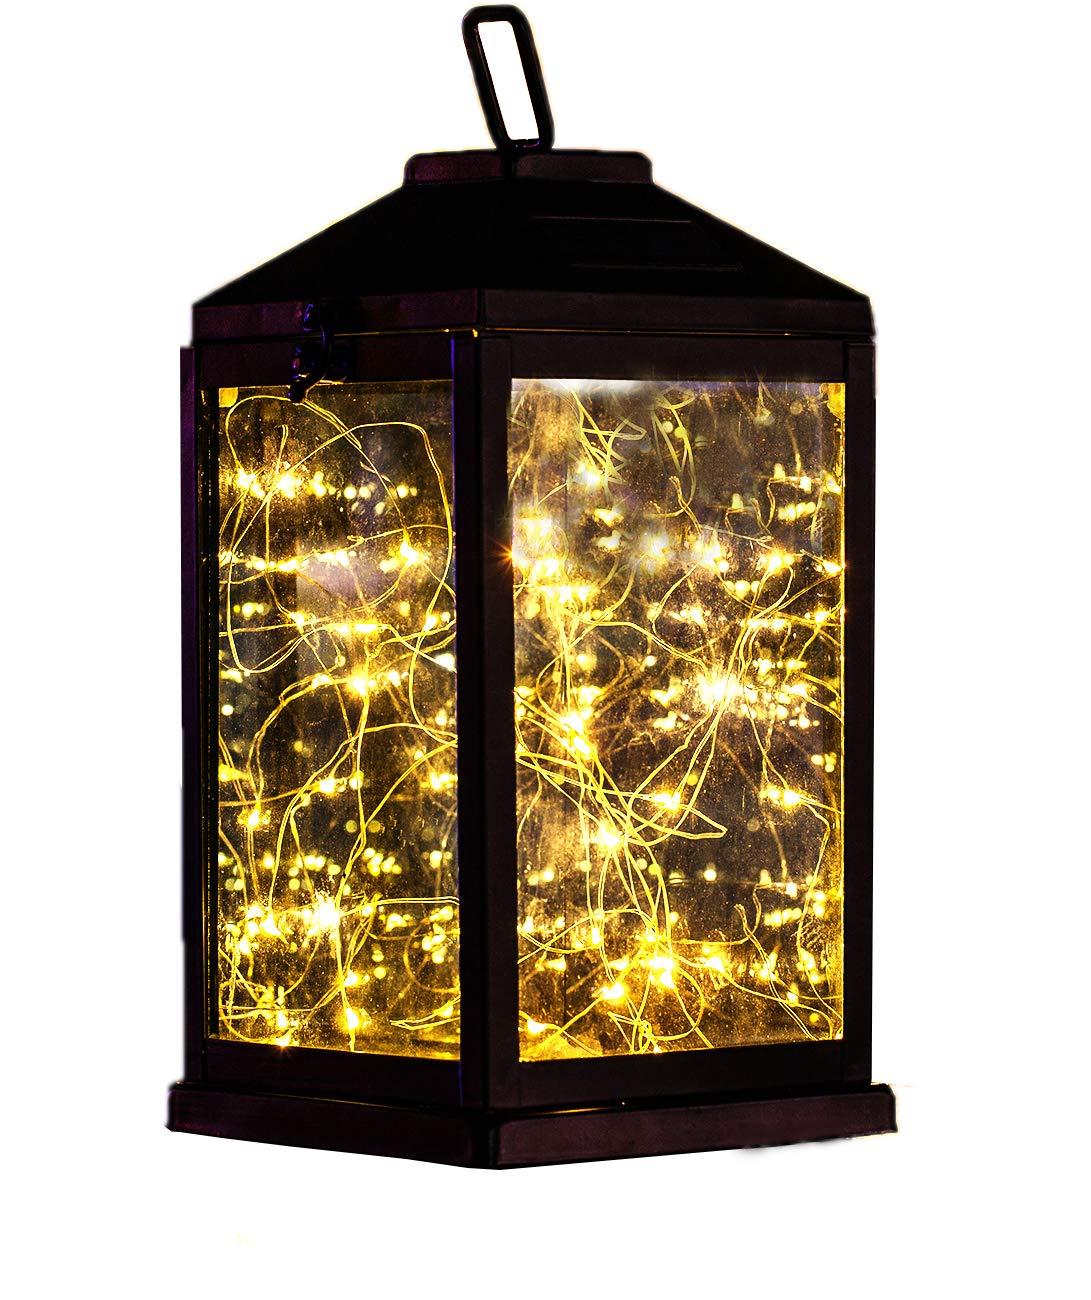 Solar Lantern Lights Metal Sunwind with 30 Warm White LEDs Fairy String Lights Outdoor Decorative Table Lamp (Black-11.4''H)